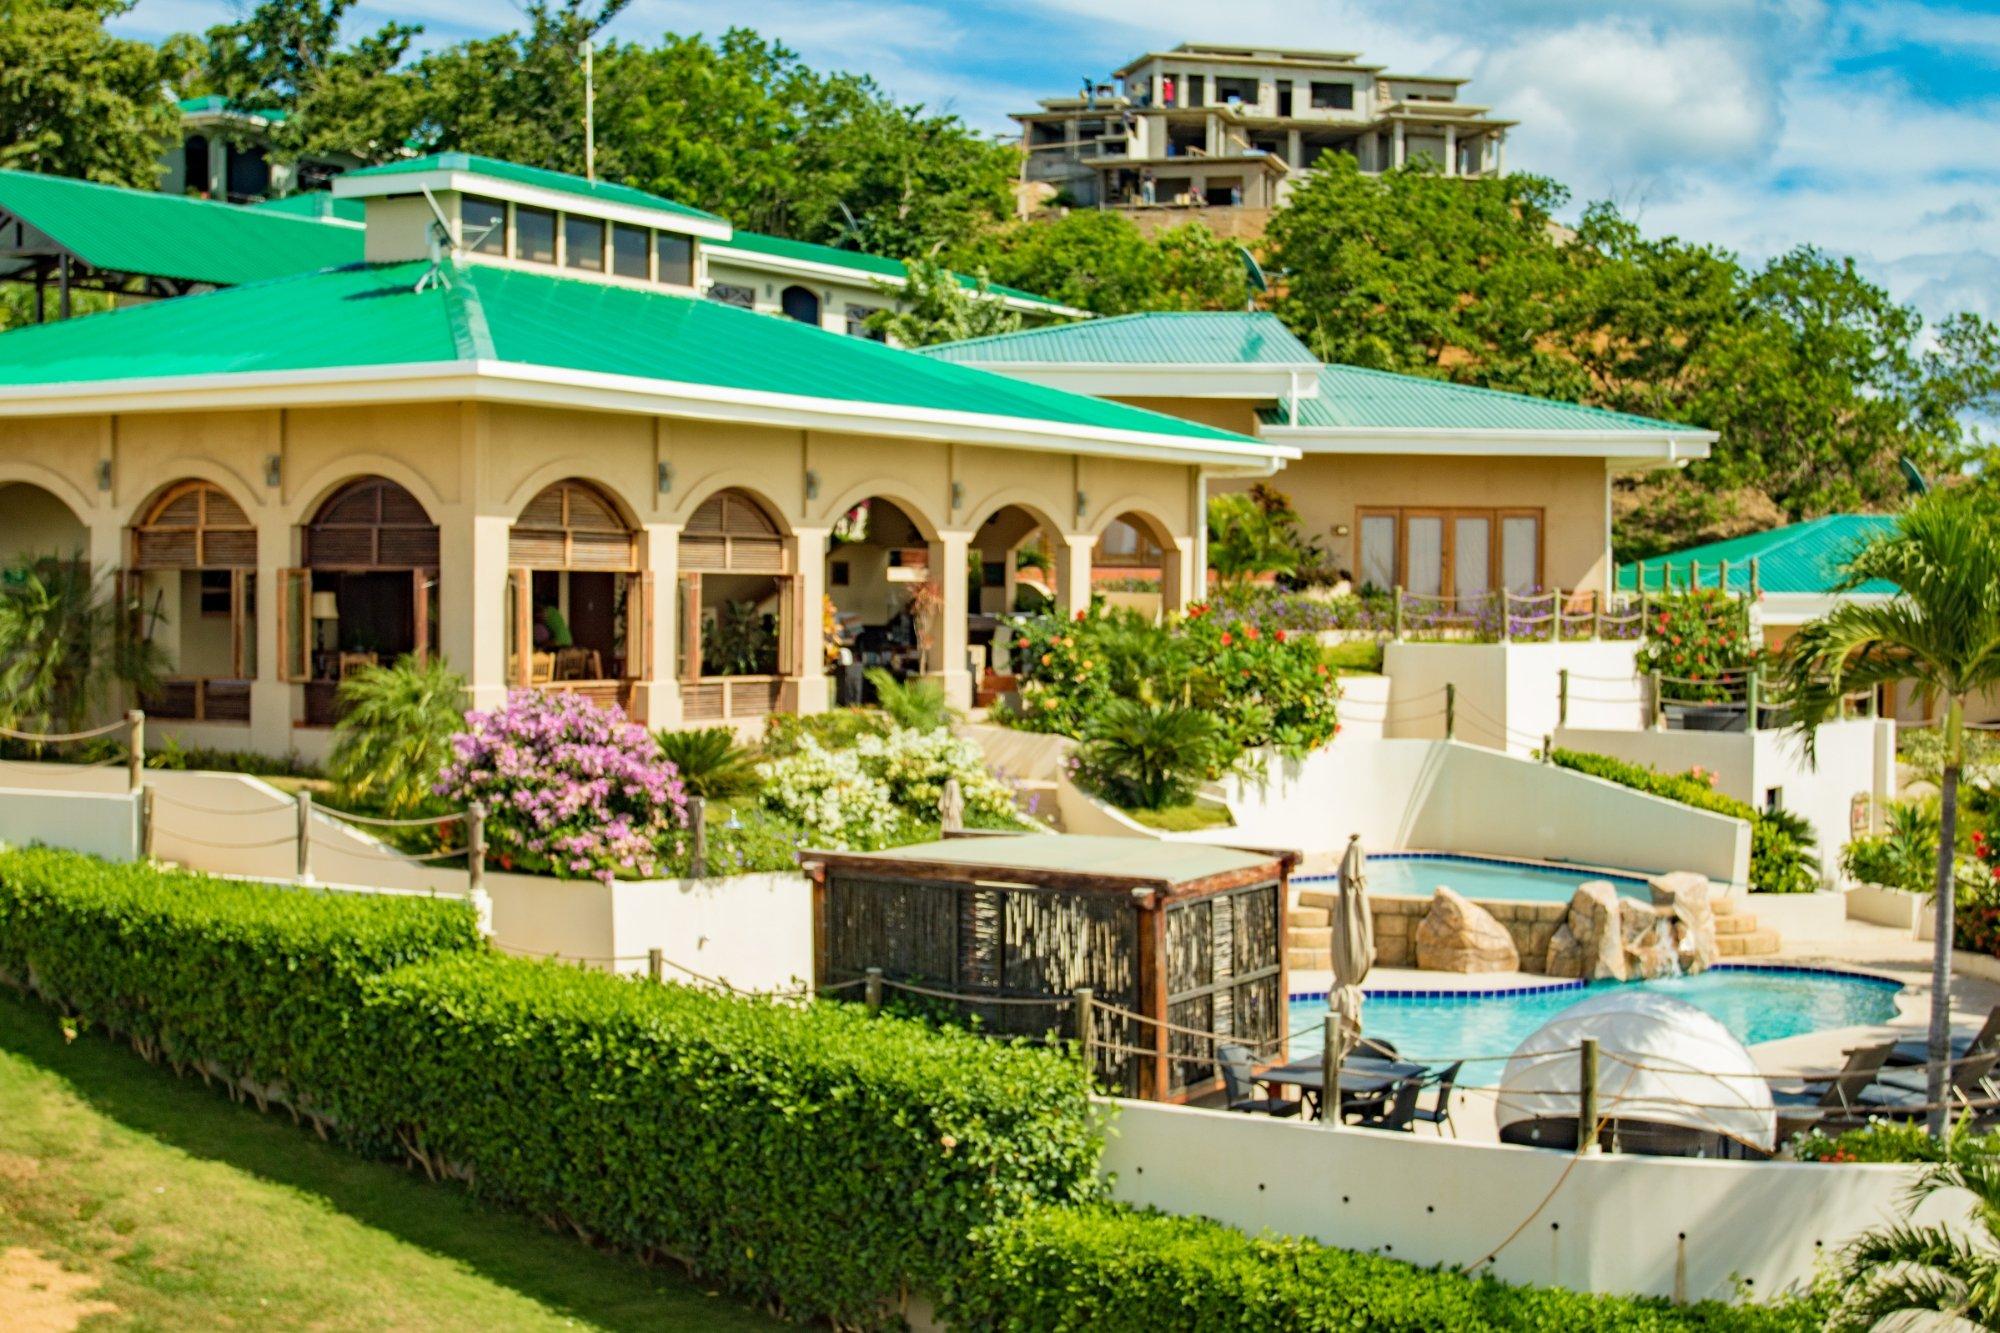 La Jolla Hotel